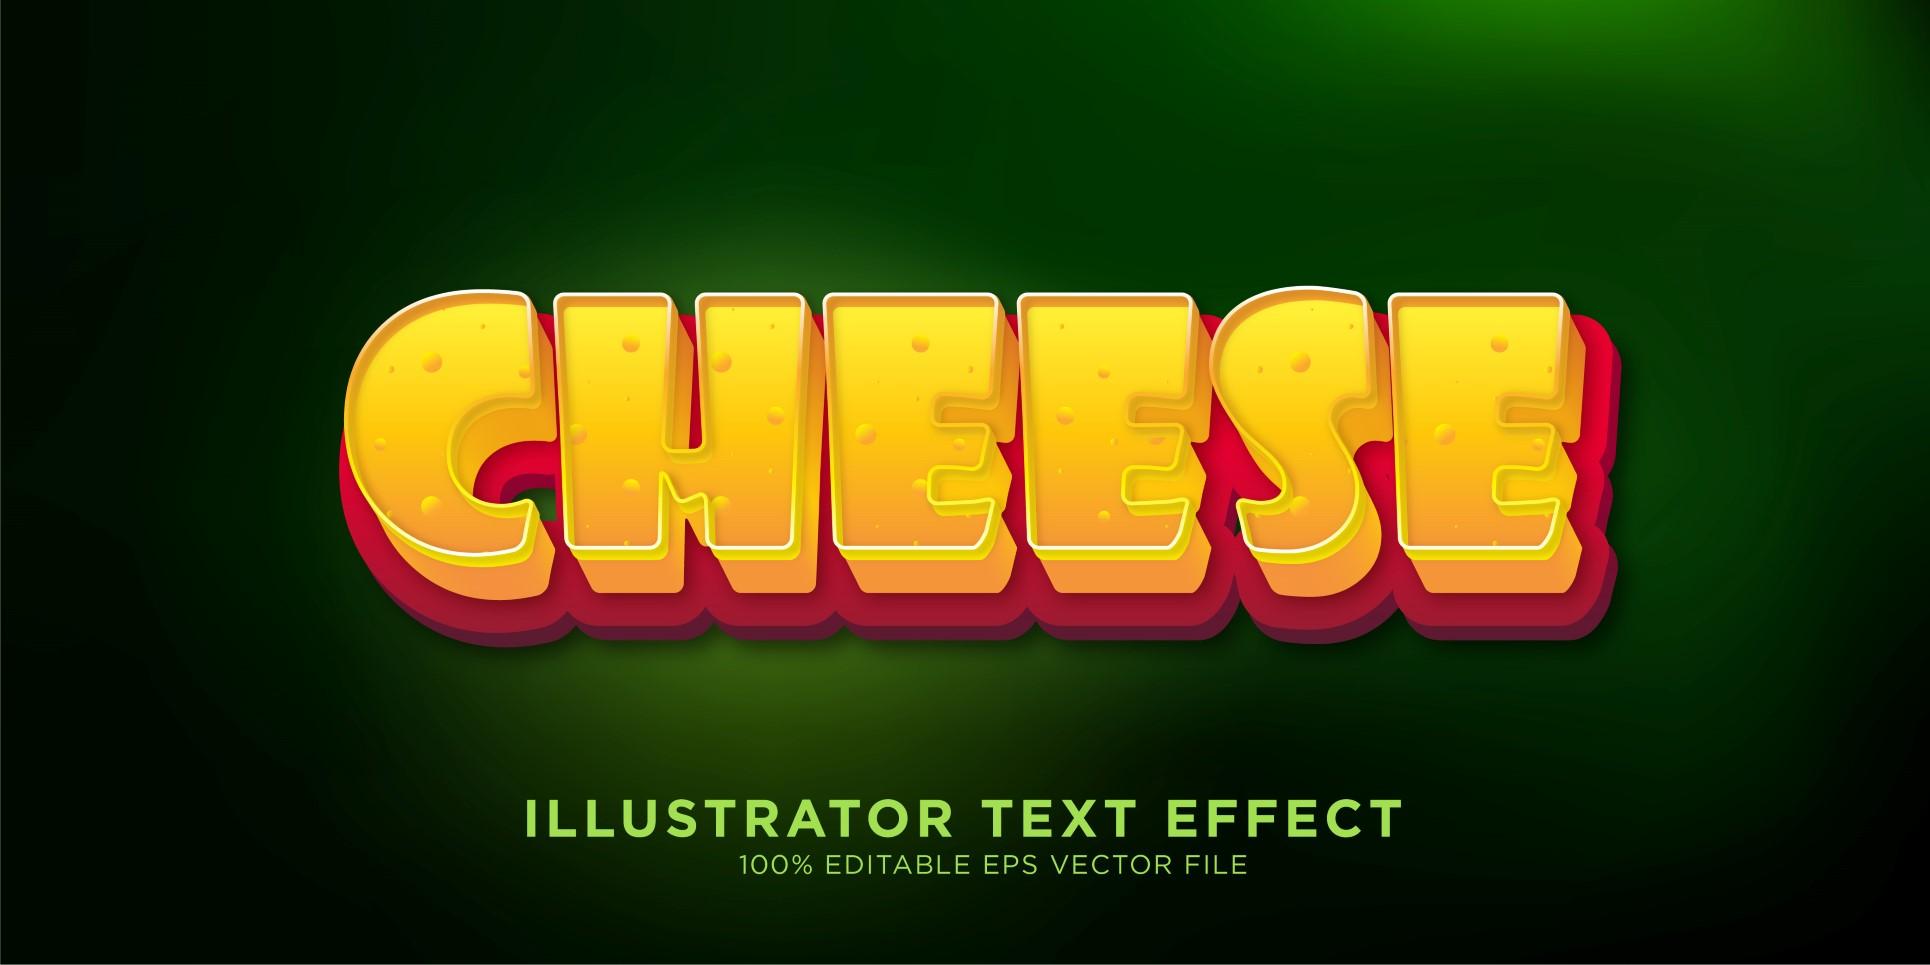 Cheese Illustrator Text Effect Illustration